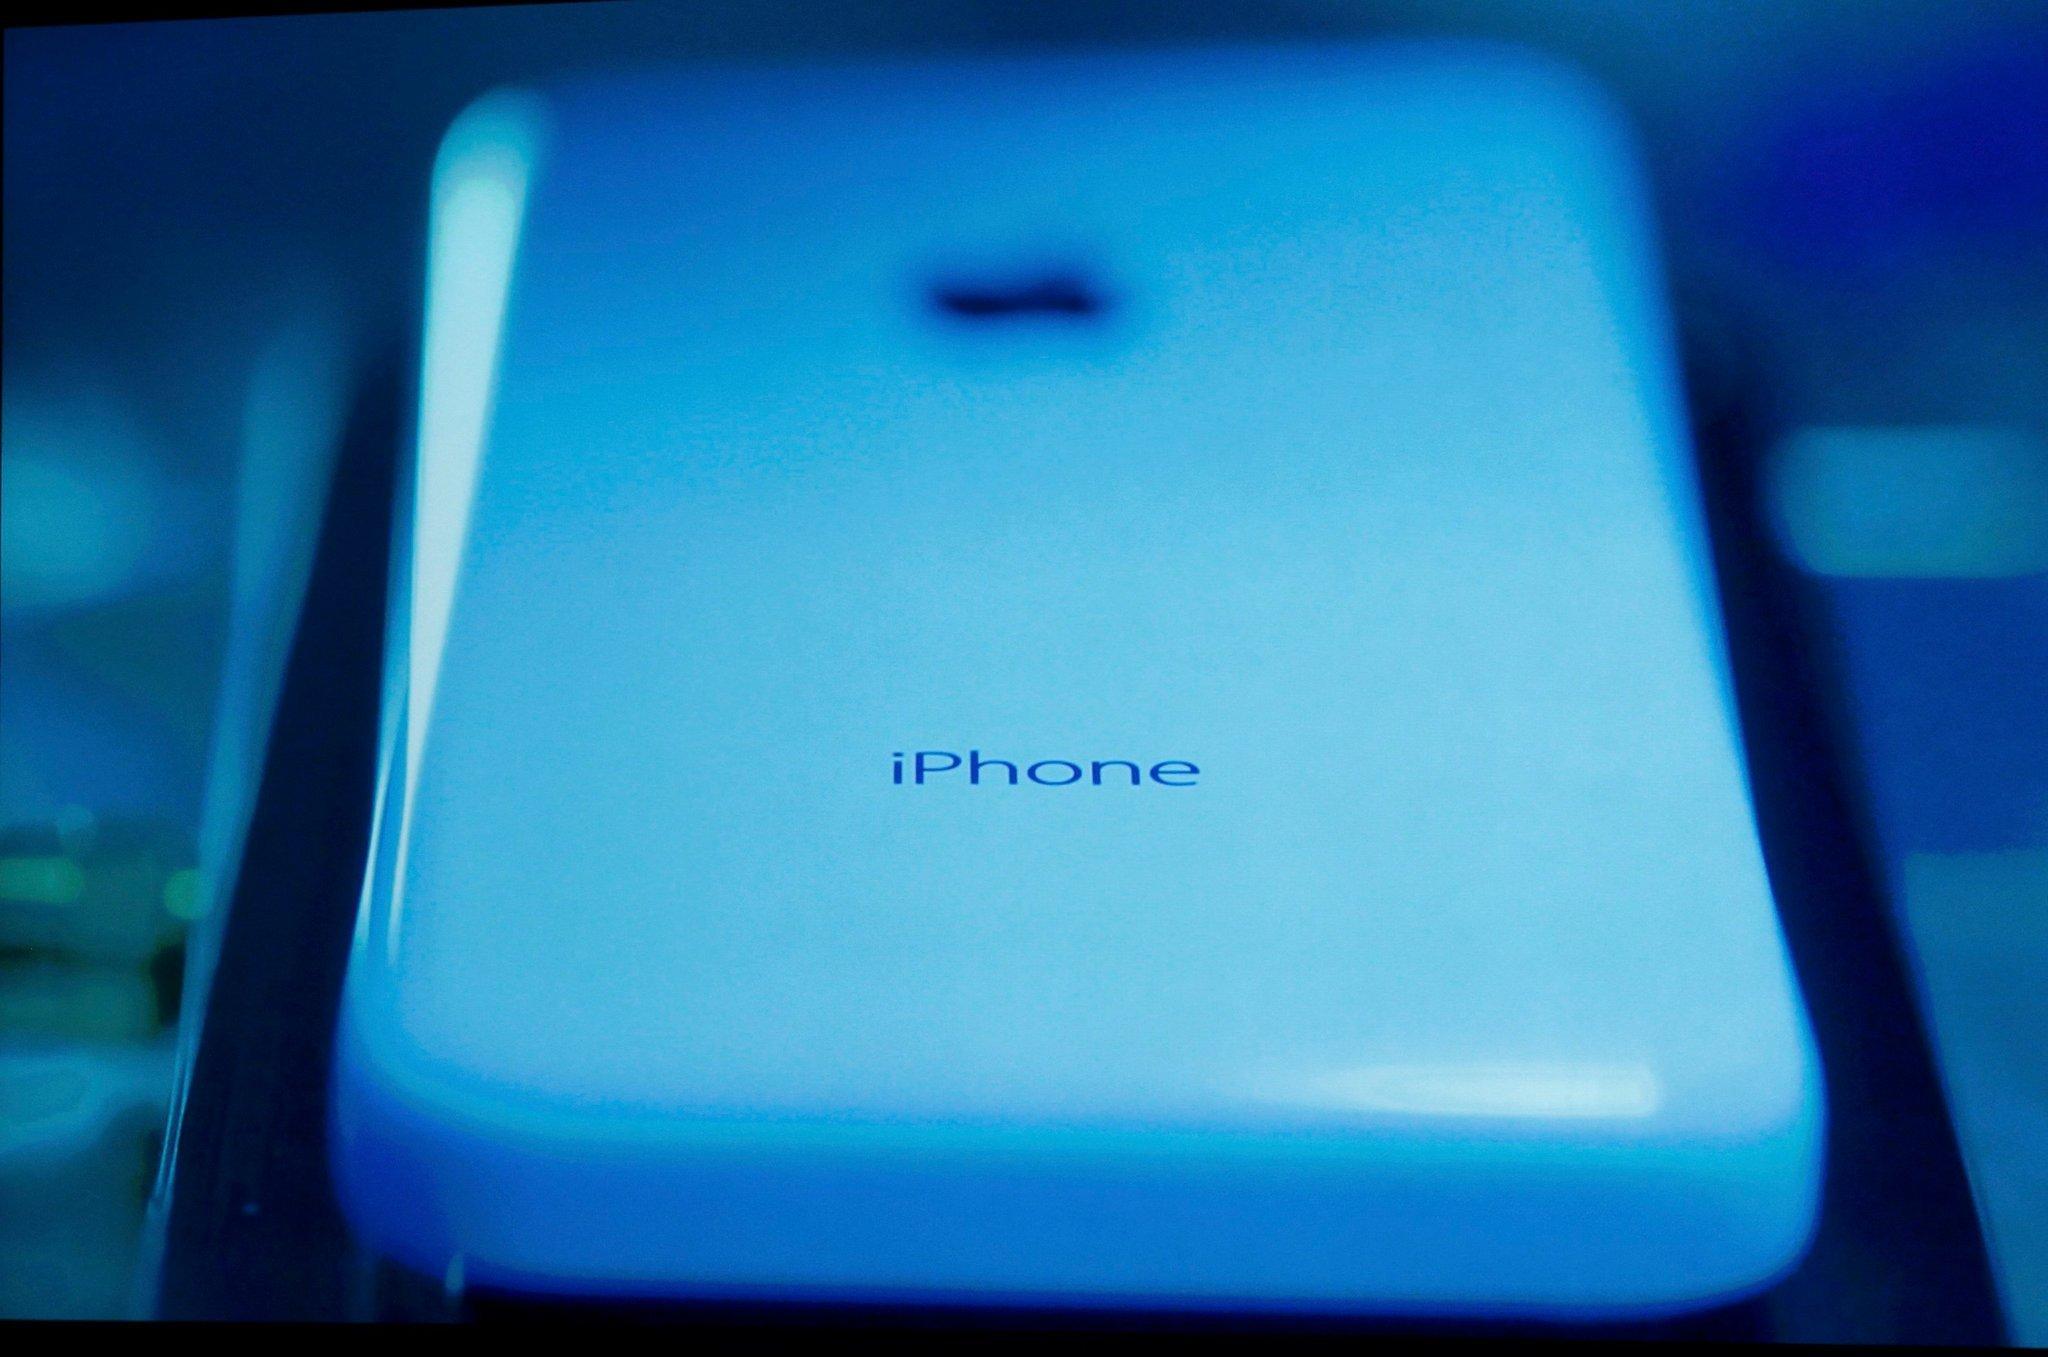 IPhone 5C Blue Wallpaper